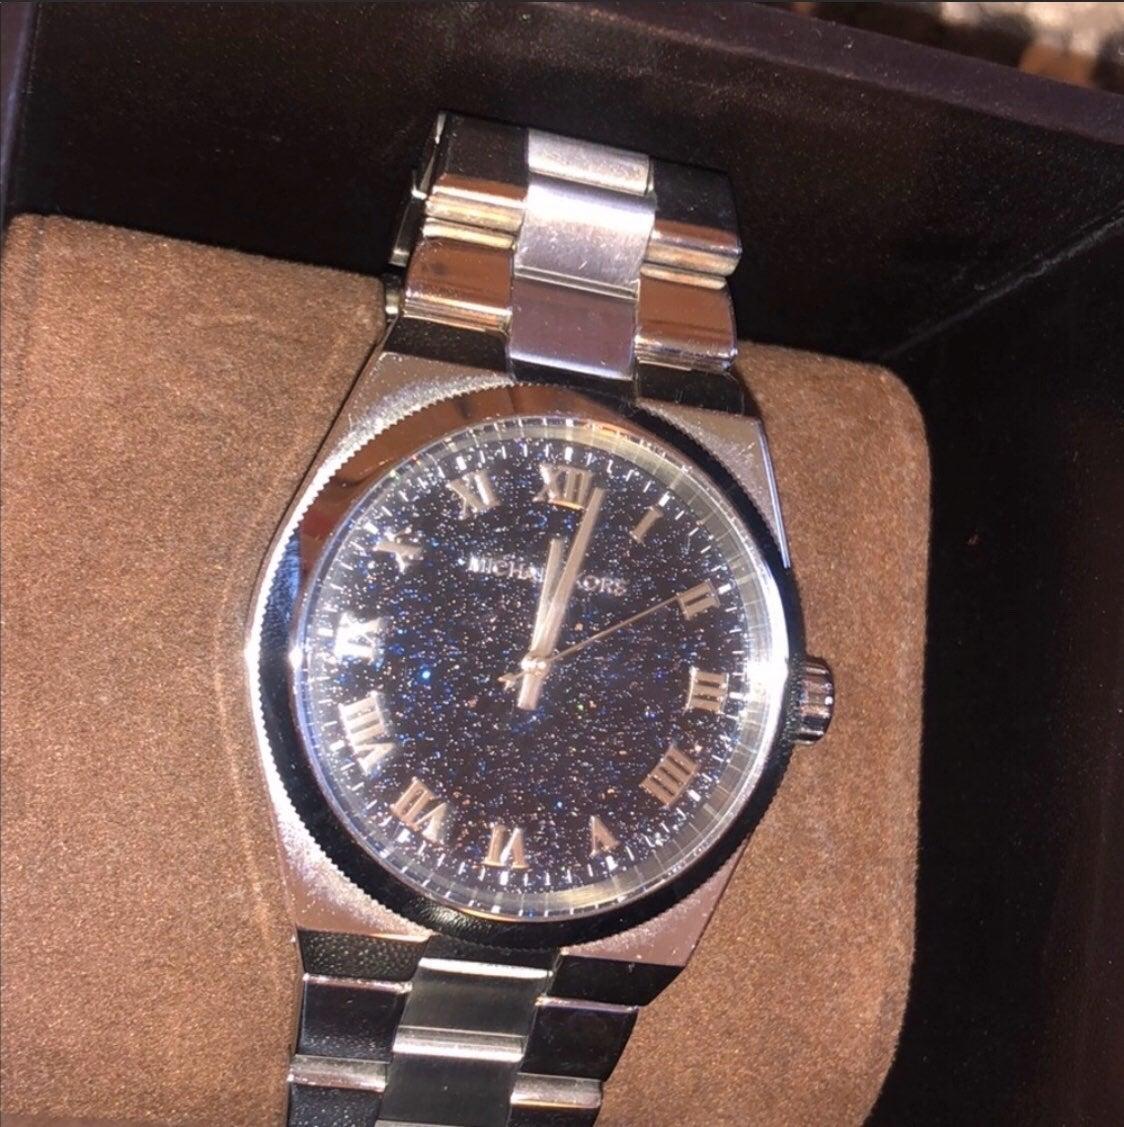 Michael Kors Silver Sparkle-face Watch